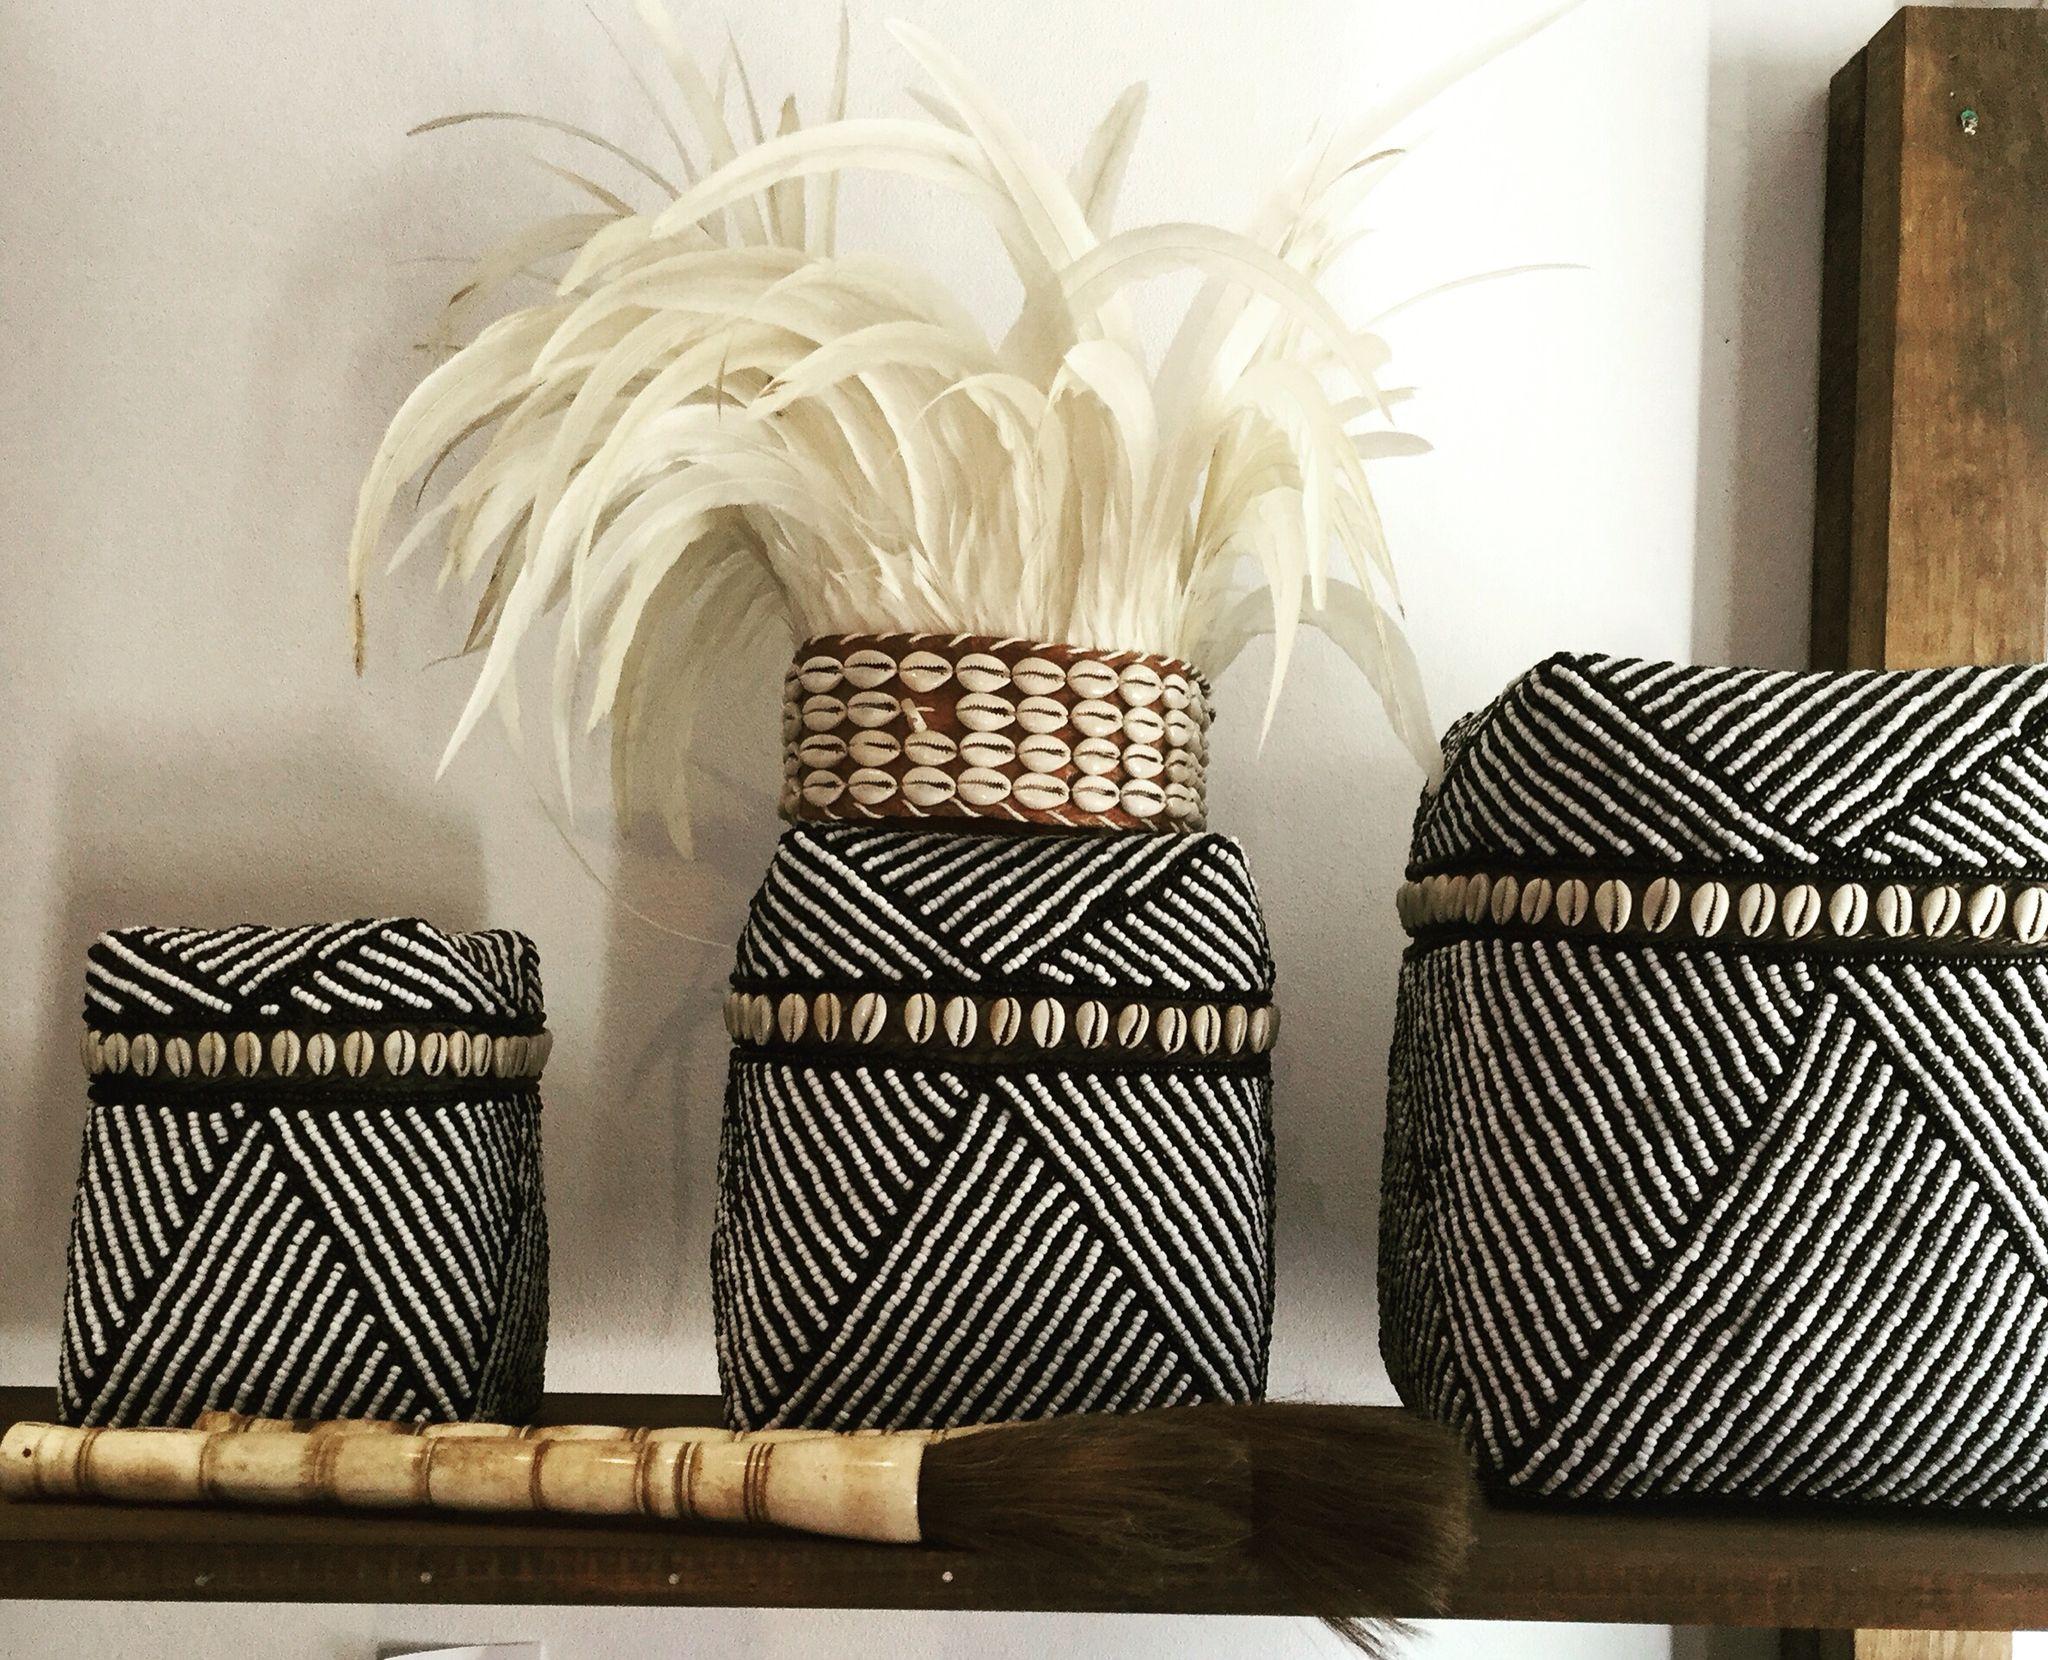 Pin von manuela metzler auf afrika decor pinterest afrikanische deko deko und dekoration - Afrikanische deko ...